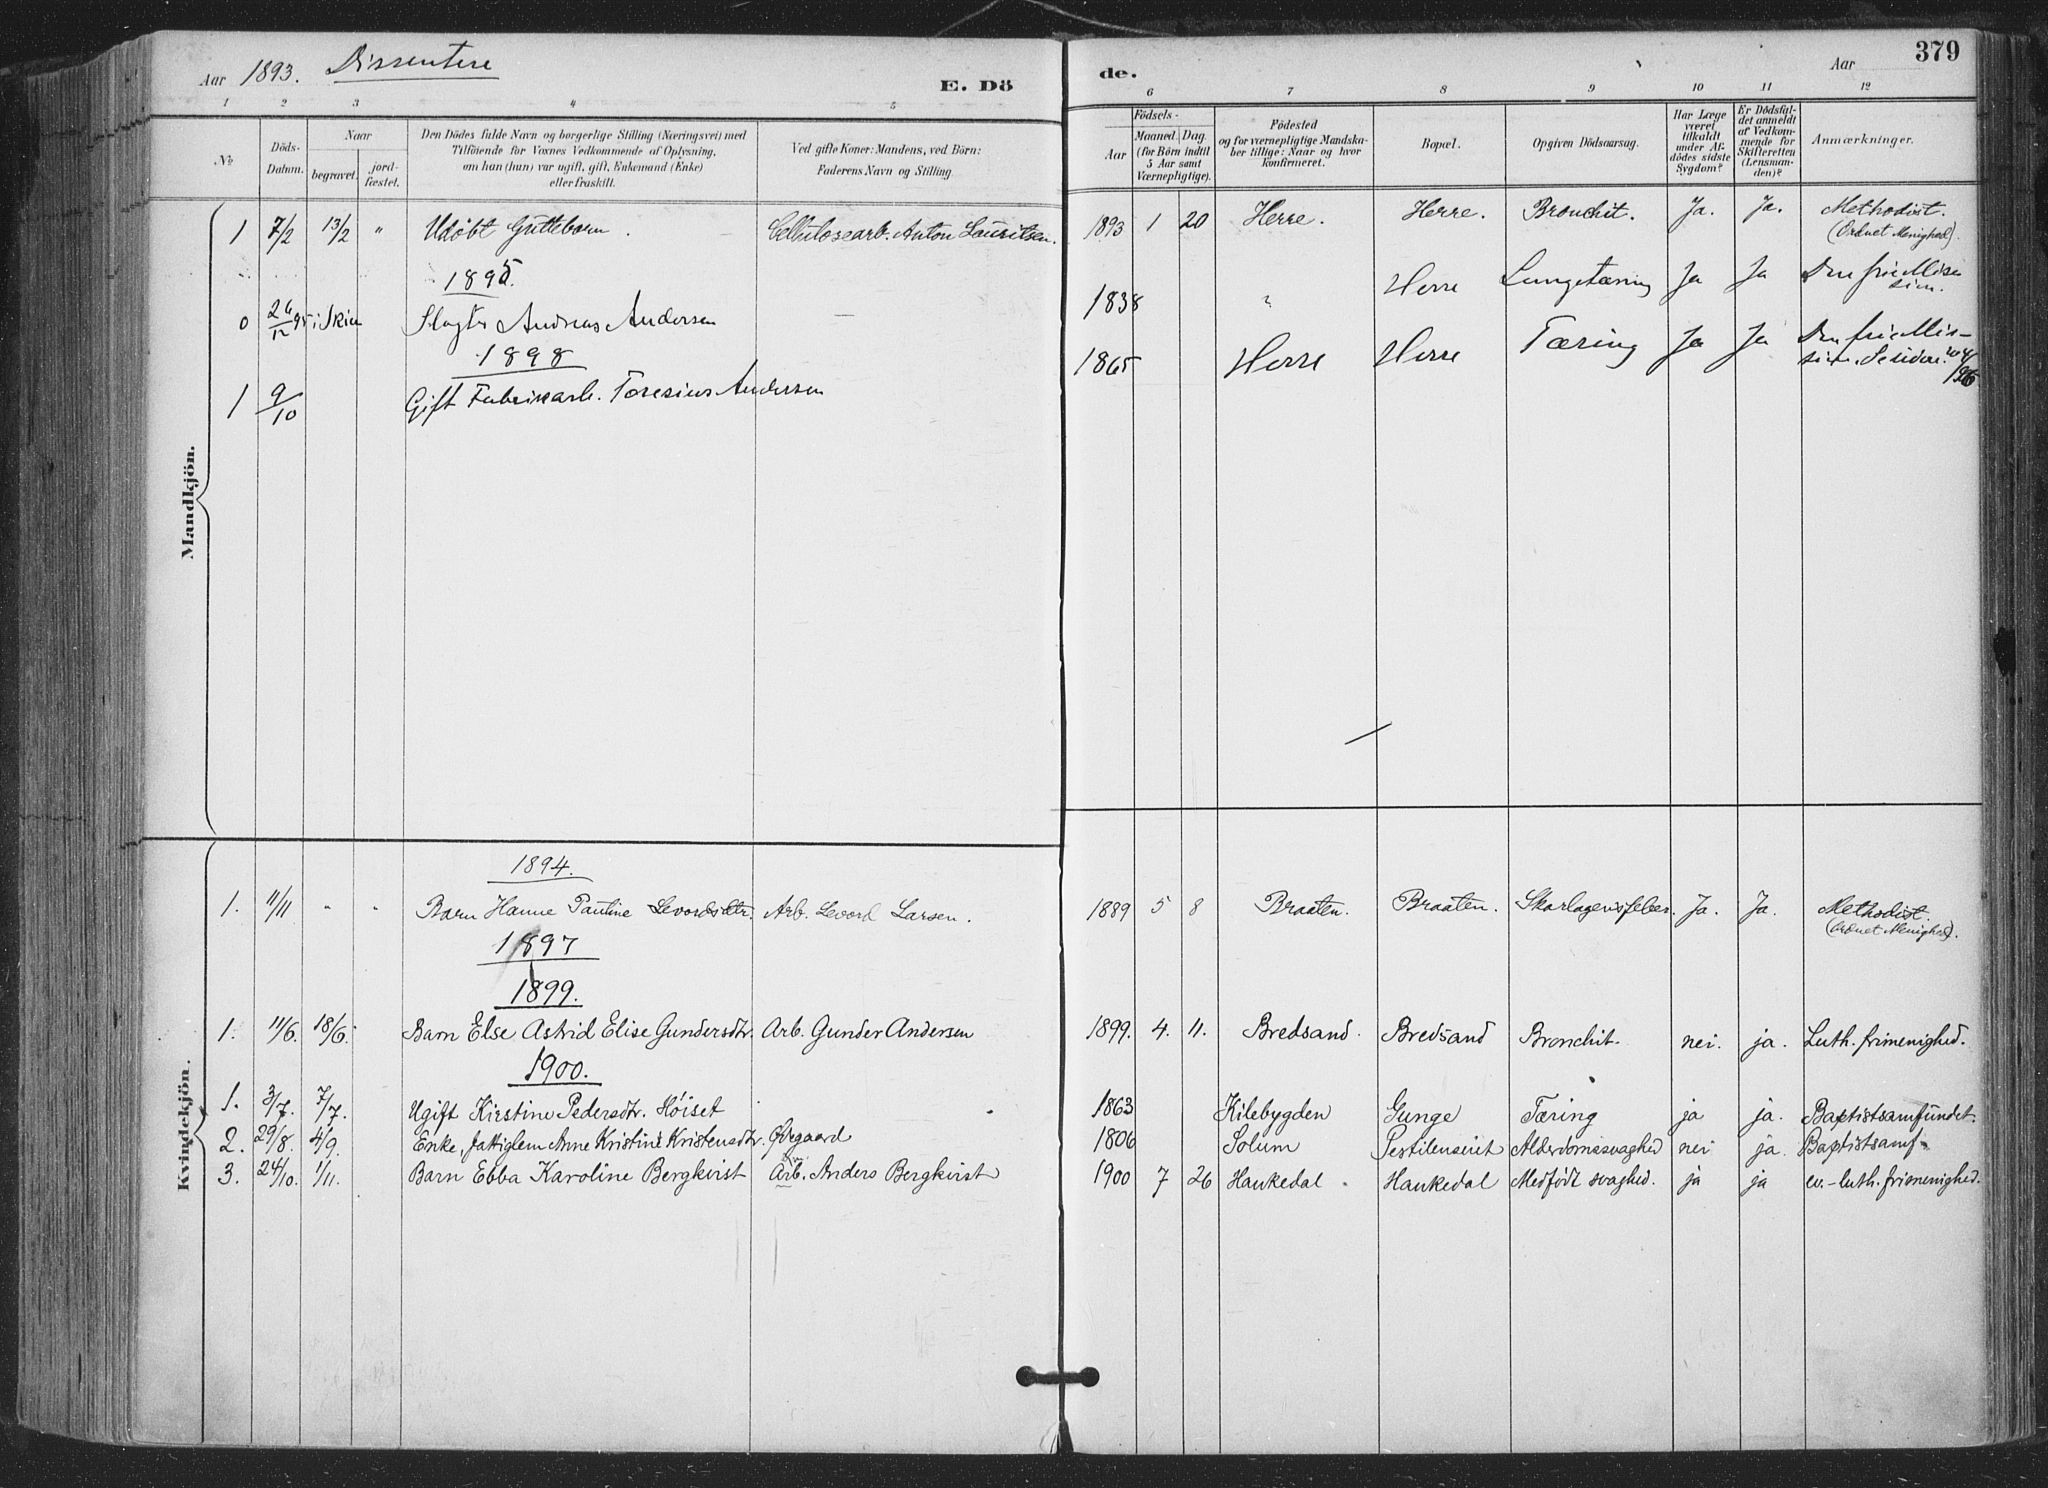 SAKO, Bamble kirkebøker, F/Fa/L0008: Ministerialbok nr. I 8, 1888-1900, s. 379